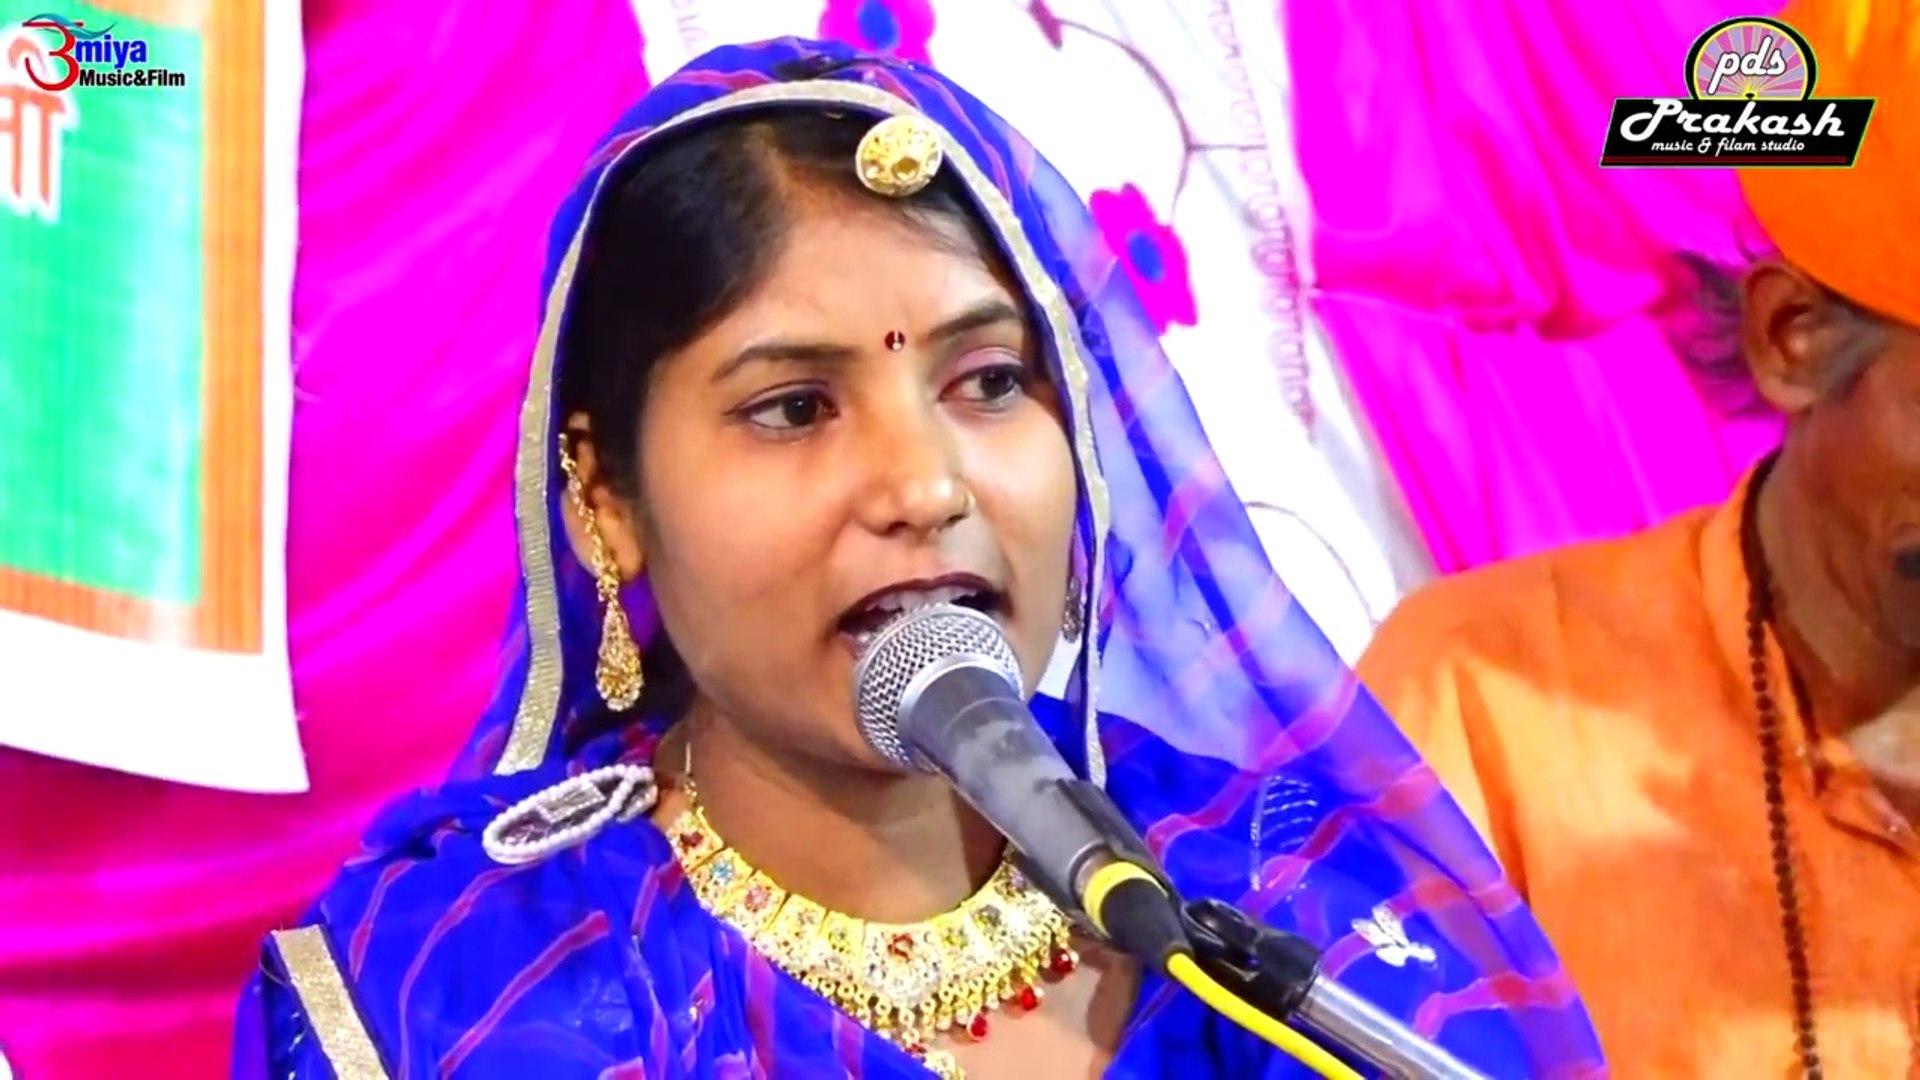 FULL HD Video | Marwadi Bhajan | Pushpa Barot | Govind Govind Bol | Rajasthani Live Program | Desi B